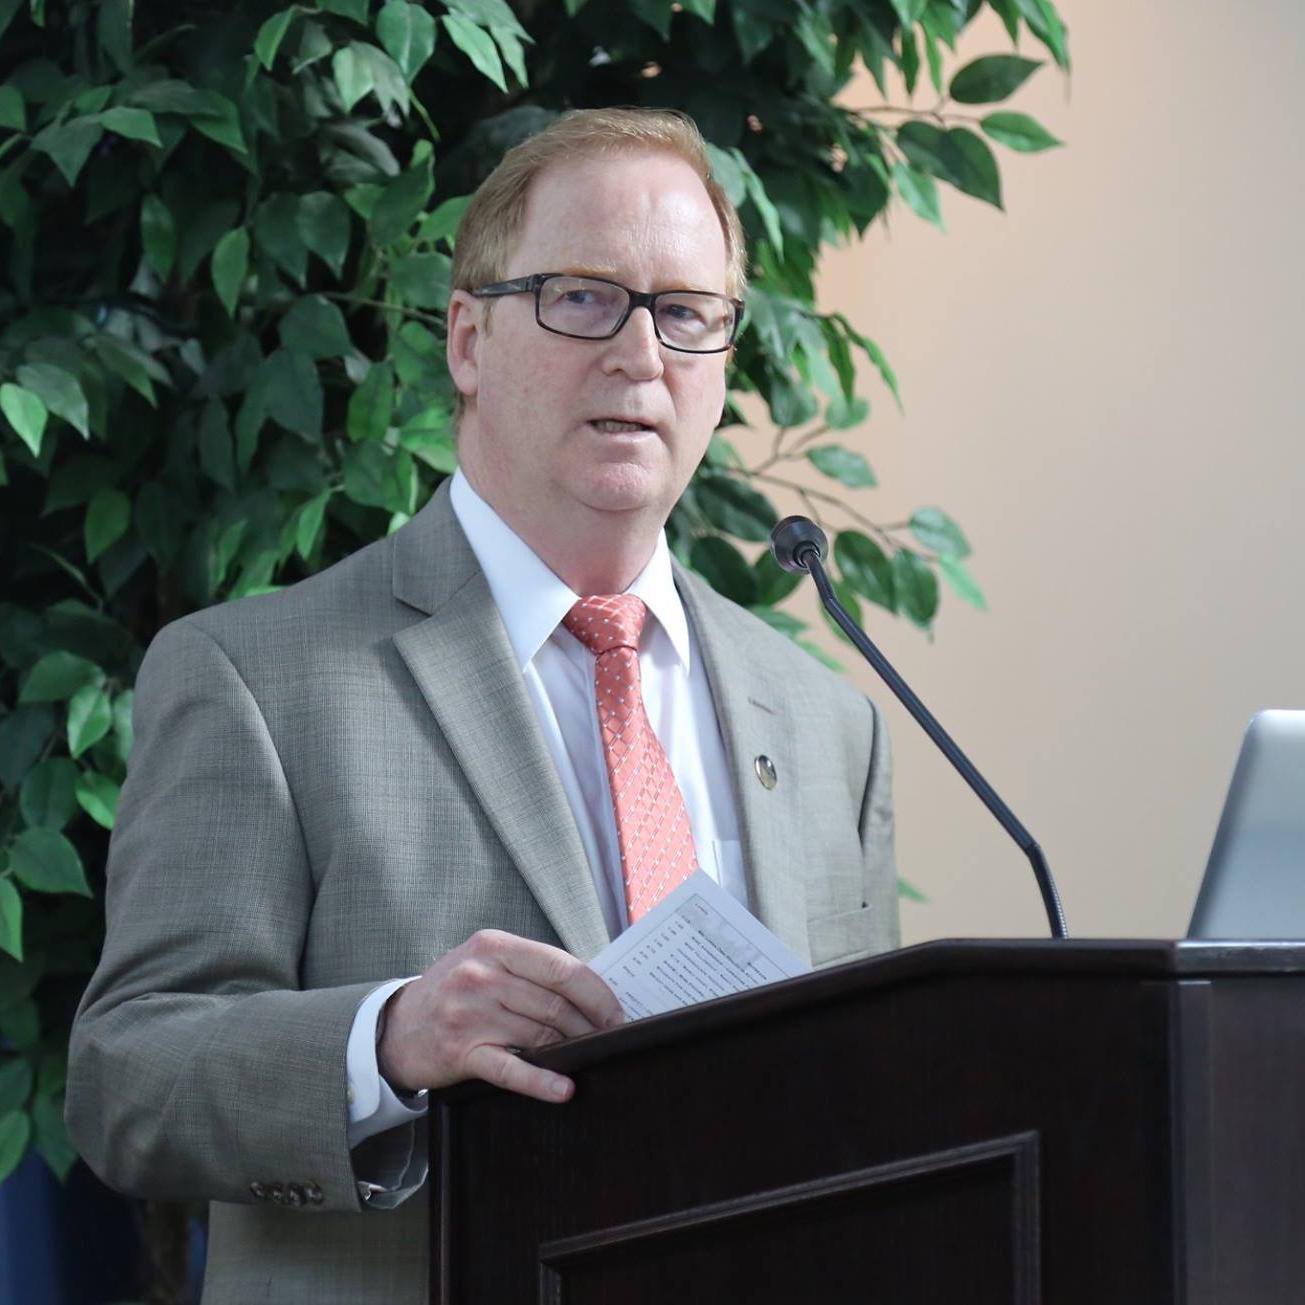 Dr. Michael Lairmore, Dean of the UC Davis School of Veterinary Medicine